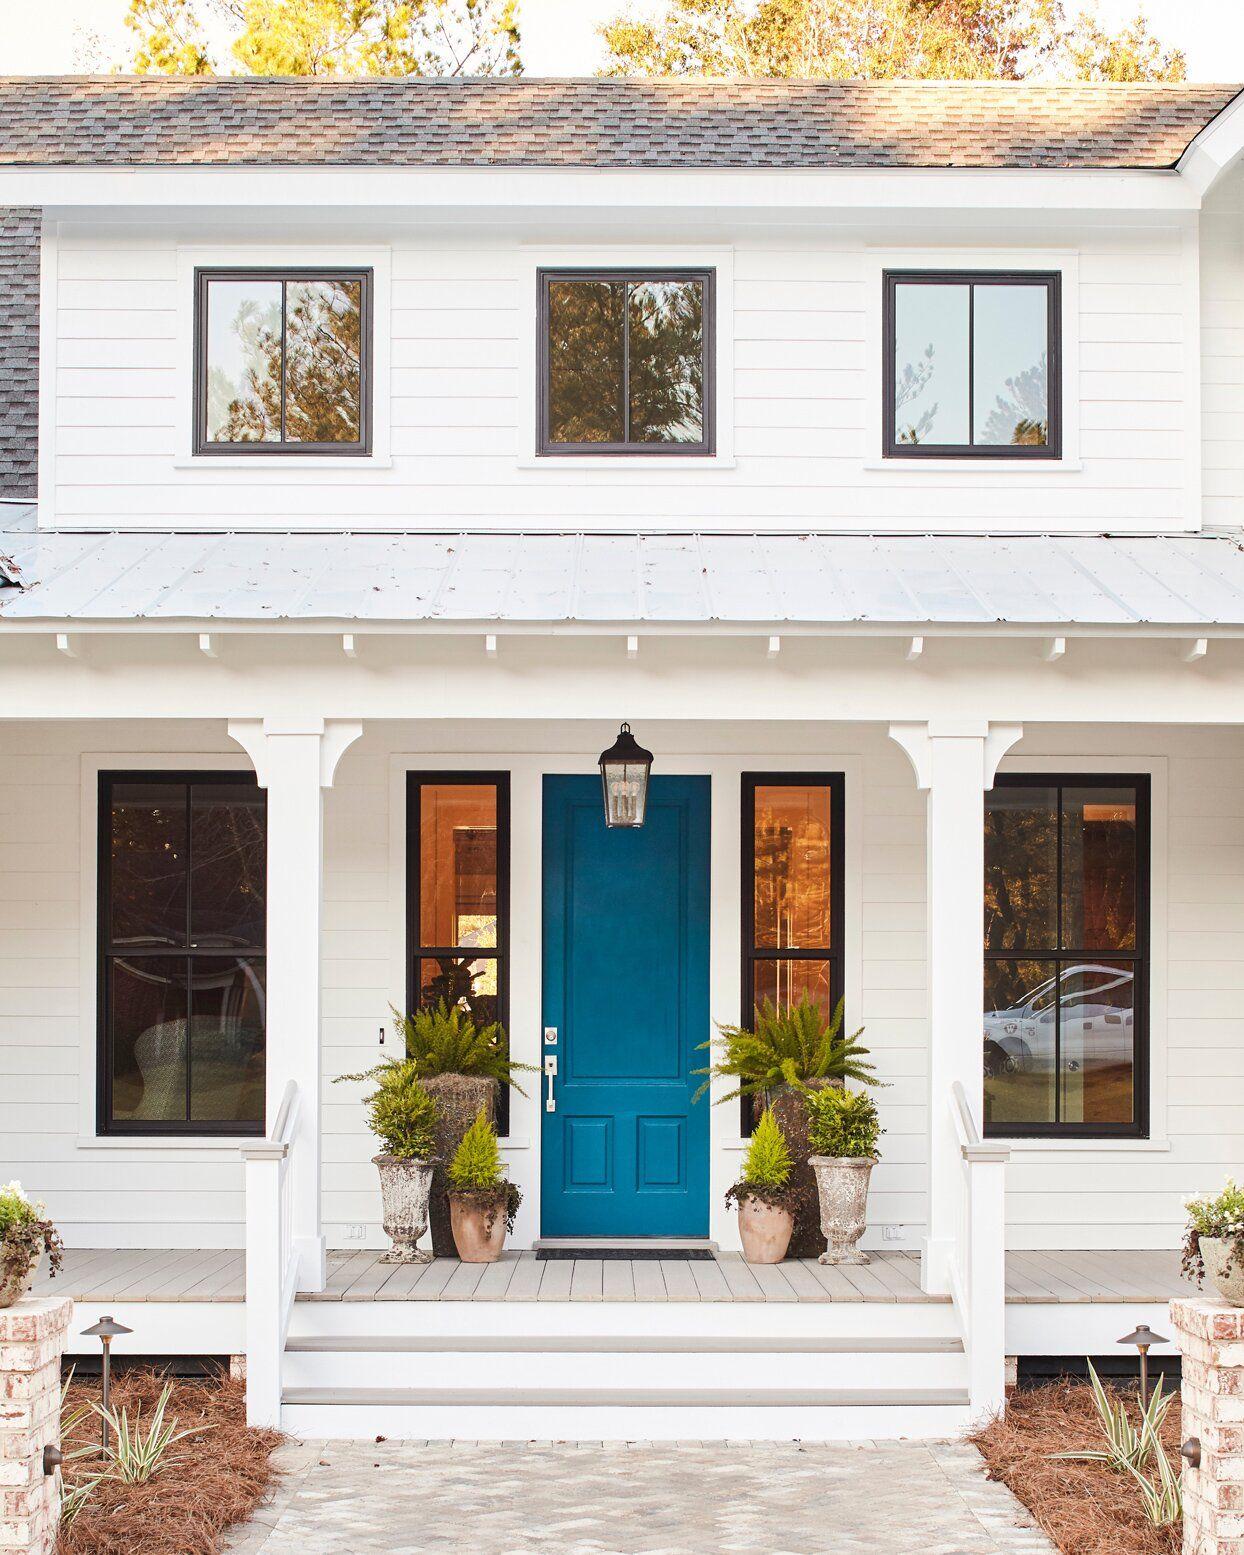 The 10 Best Paint Colors to Upgrade Your Front Door